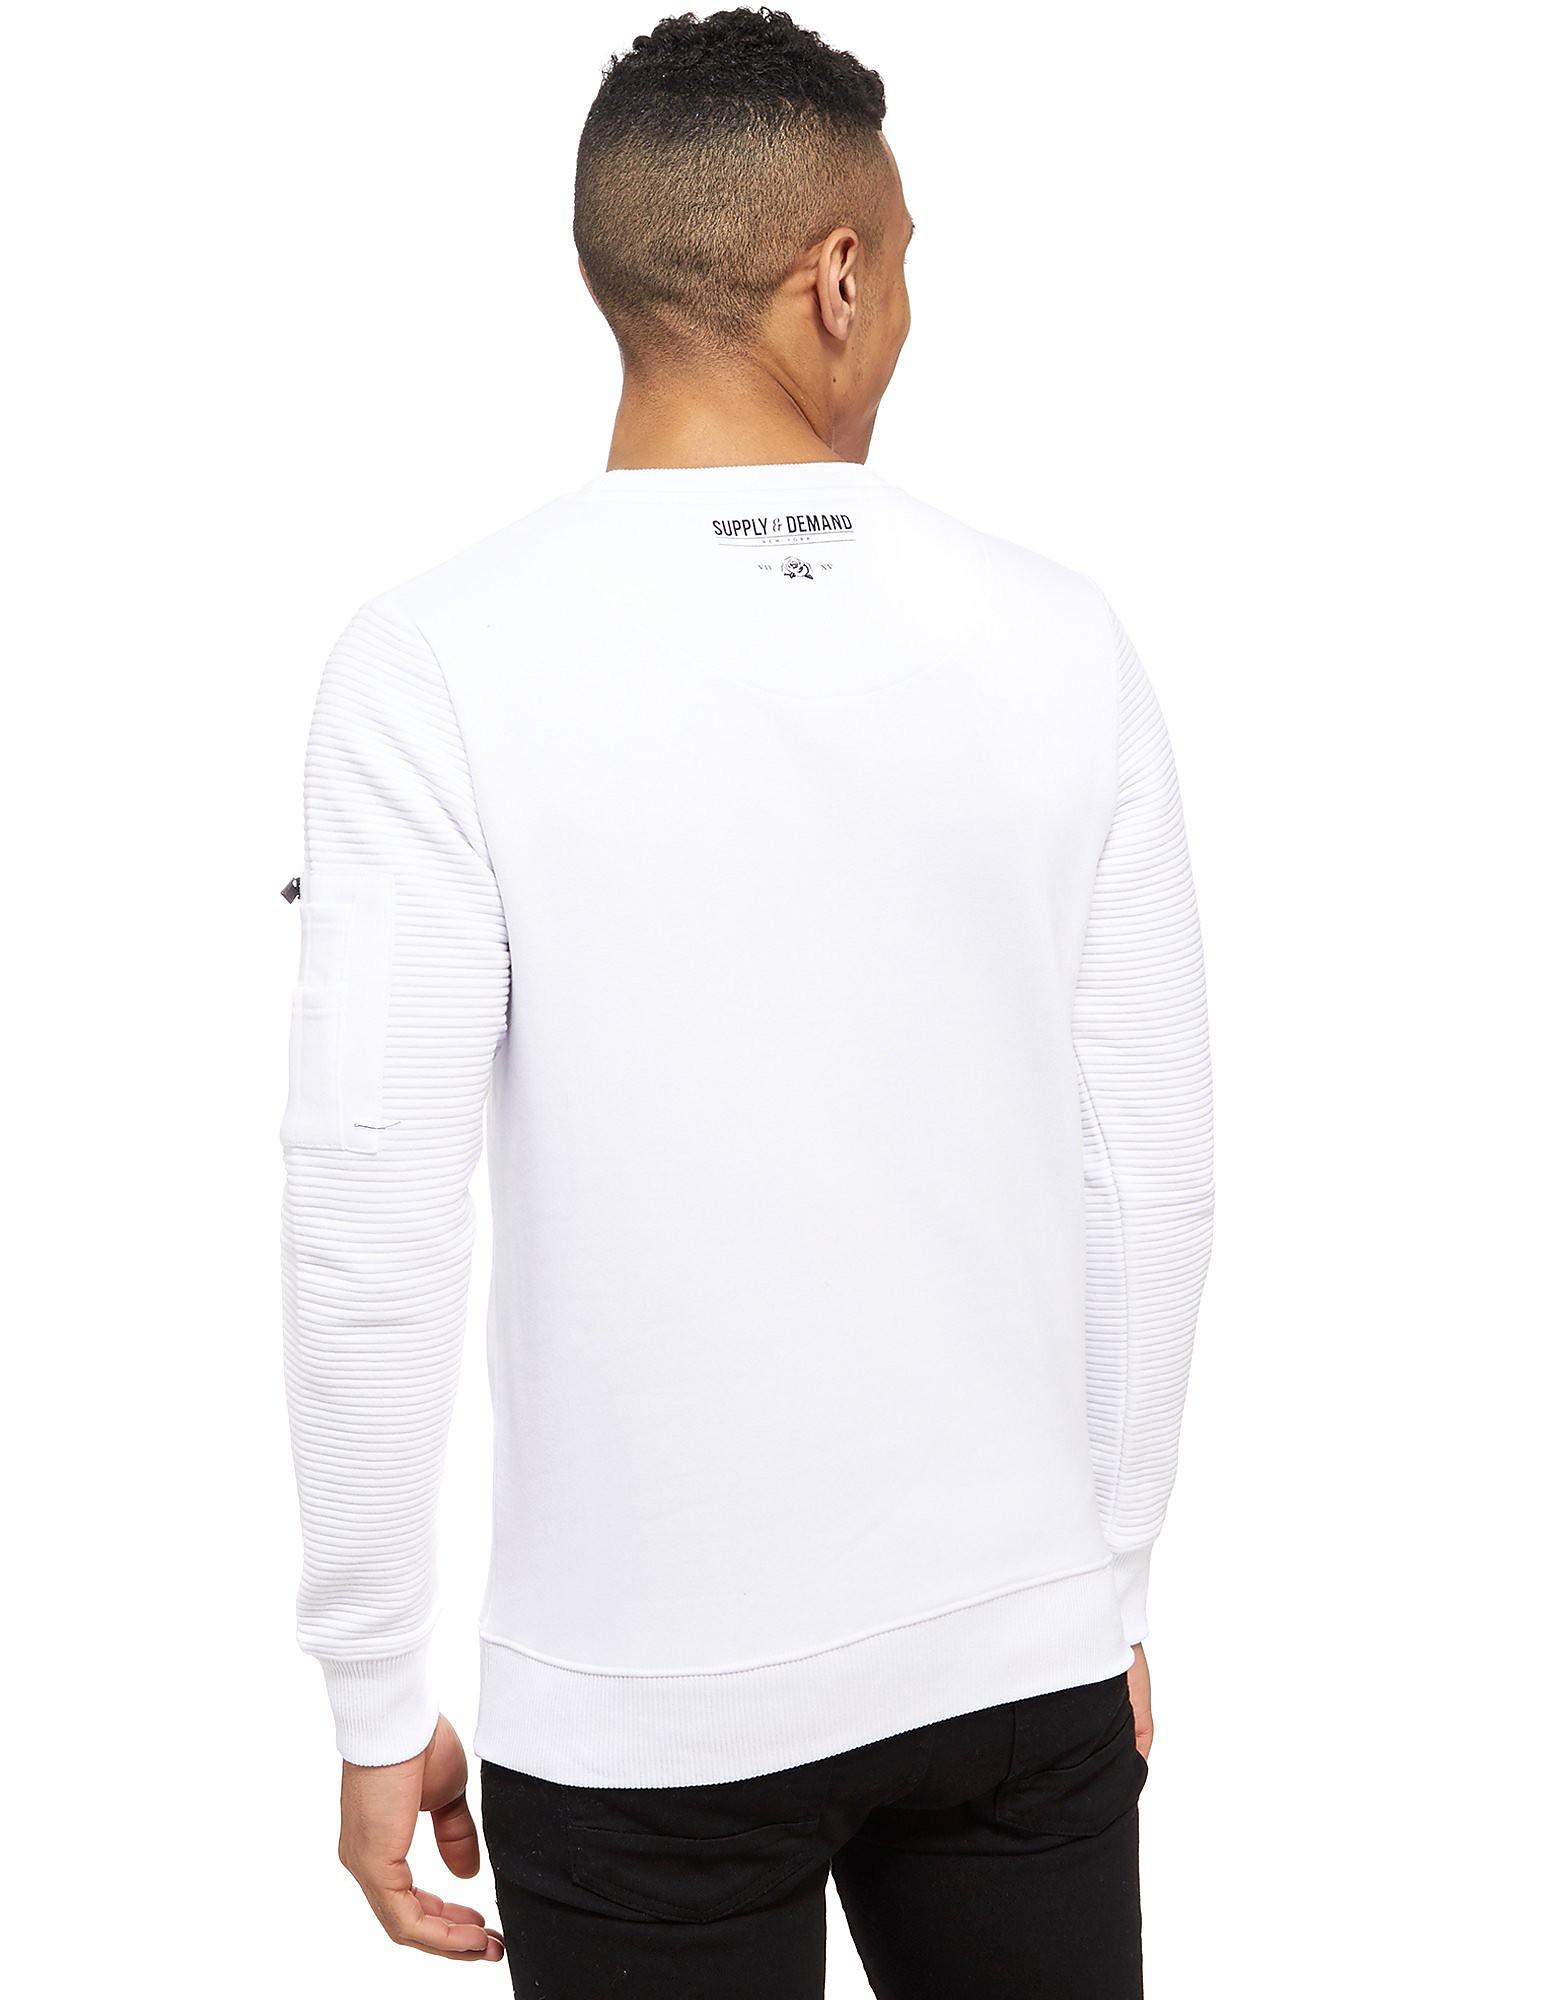 Supply & Demand Triller Crew Sweatshirt